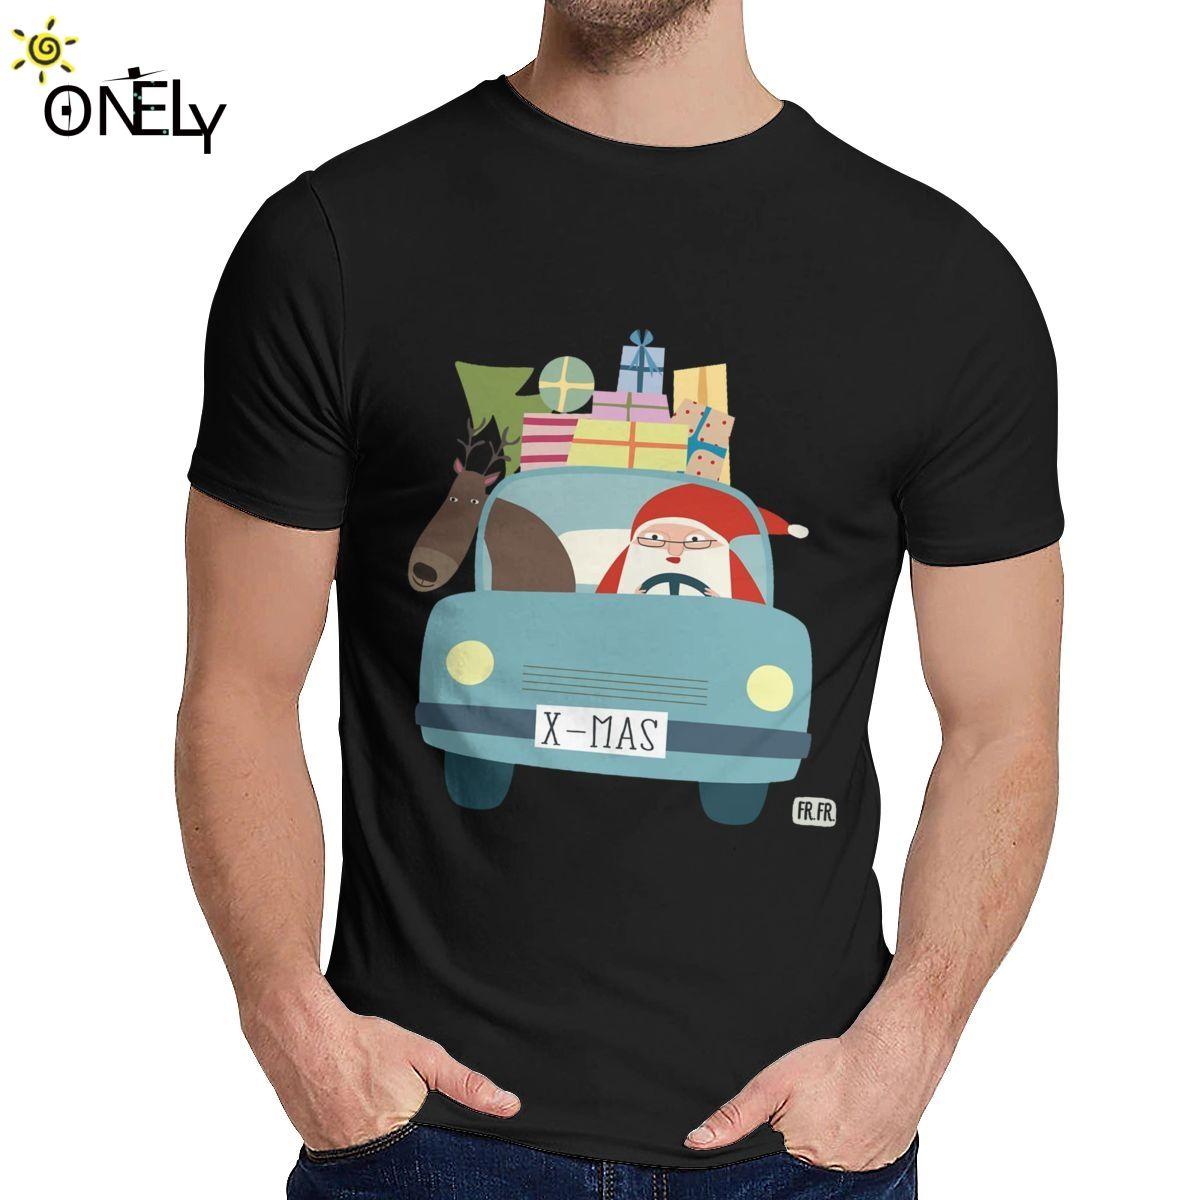 Bom Natal Cotton Santa e rena T Shirt Unisex Estilo louco surpreendente clássico O-pescoço Camiseta